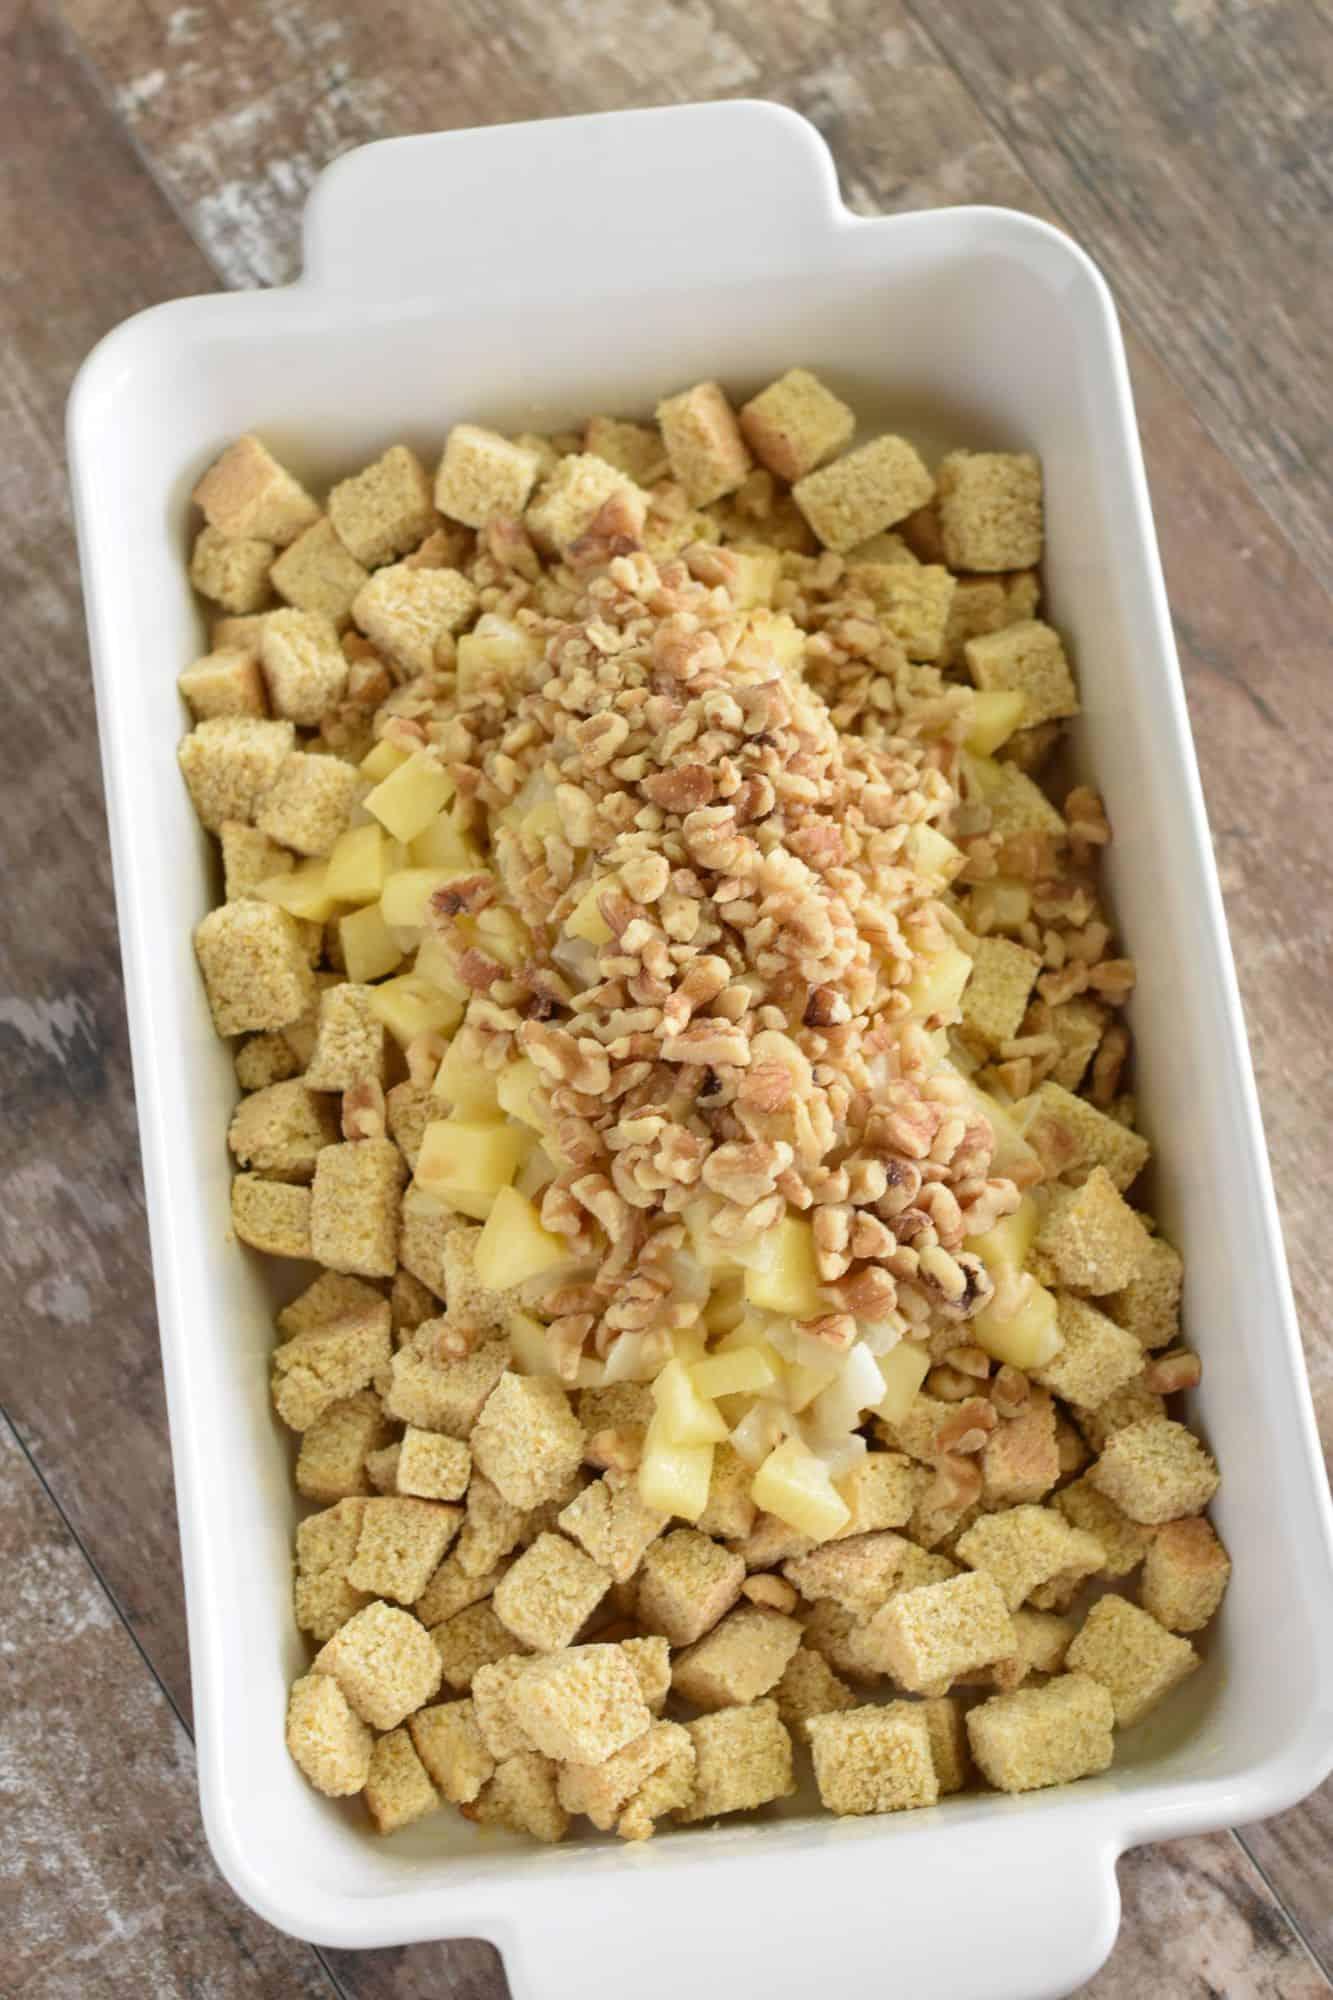 walnuts added to casserole dish